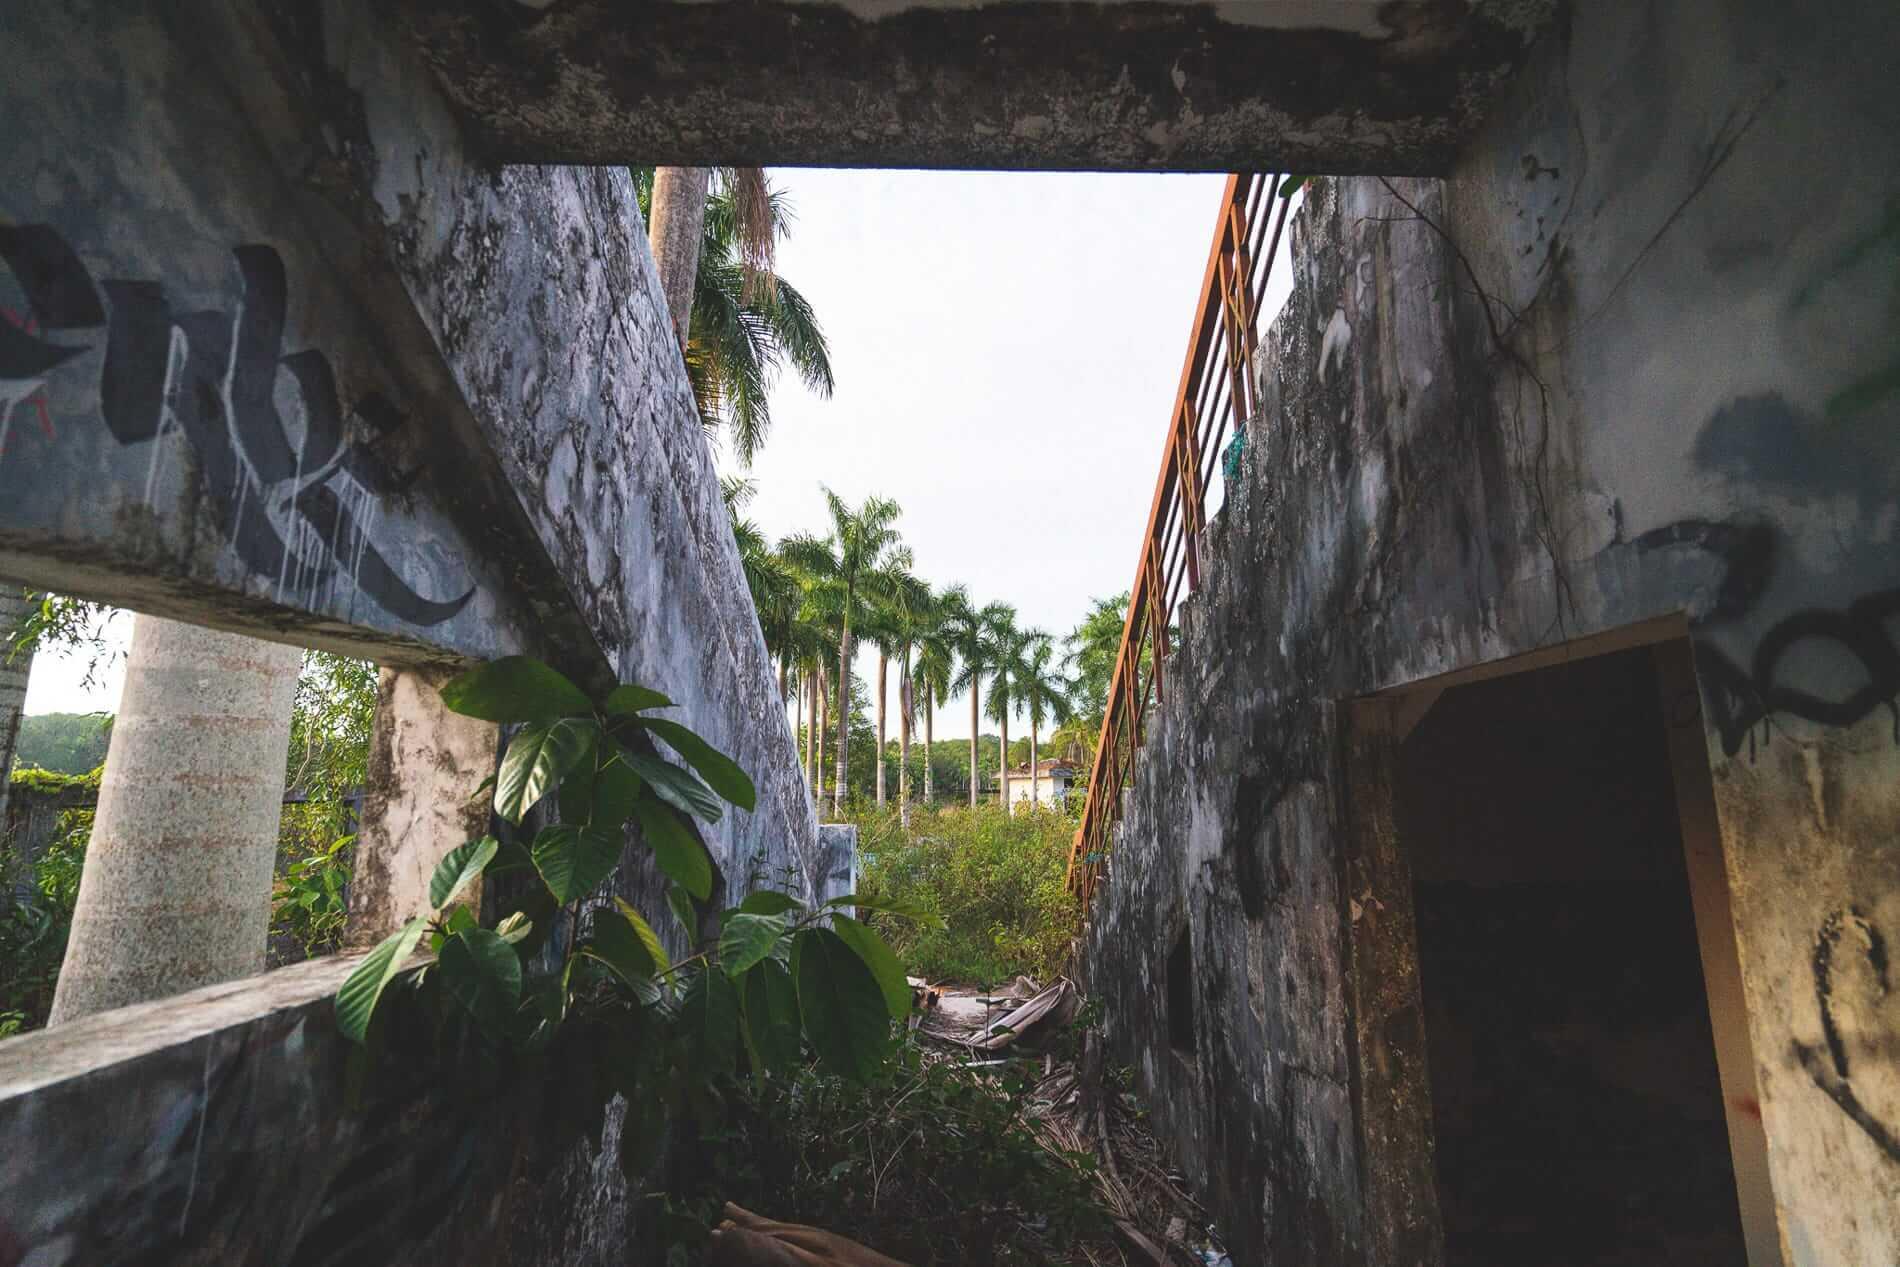 Vandalized buildings - Hues Abandoned Water Park